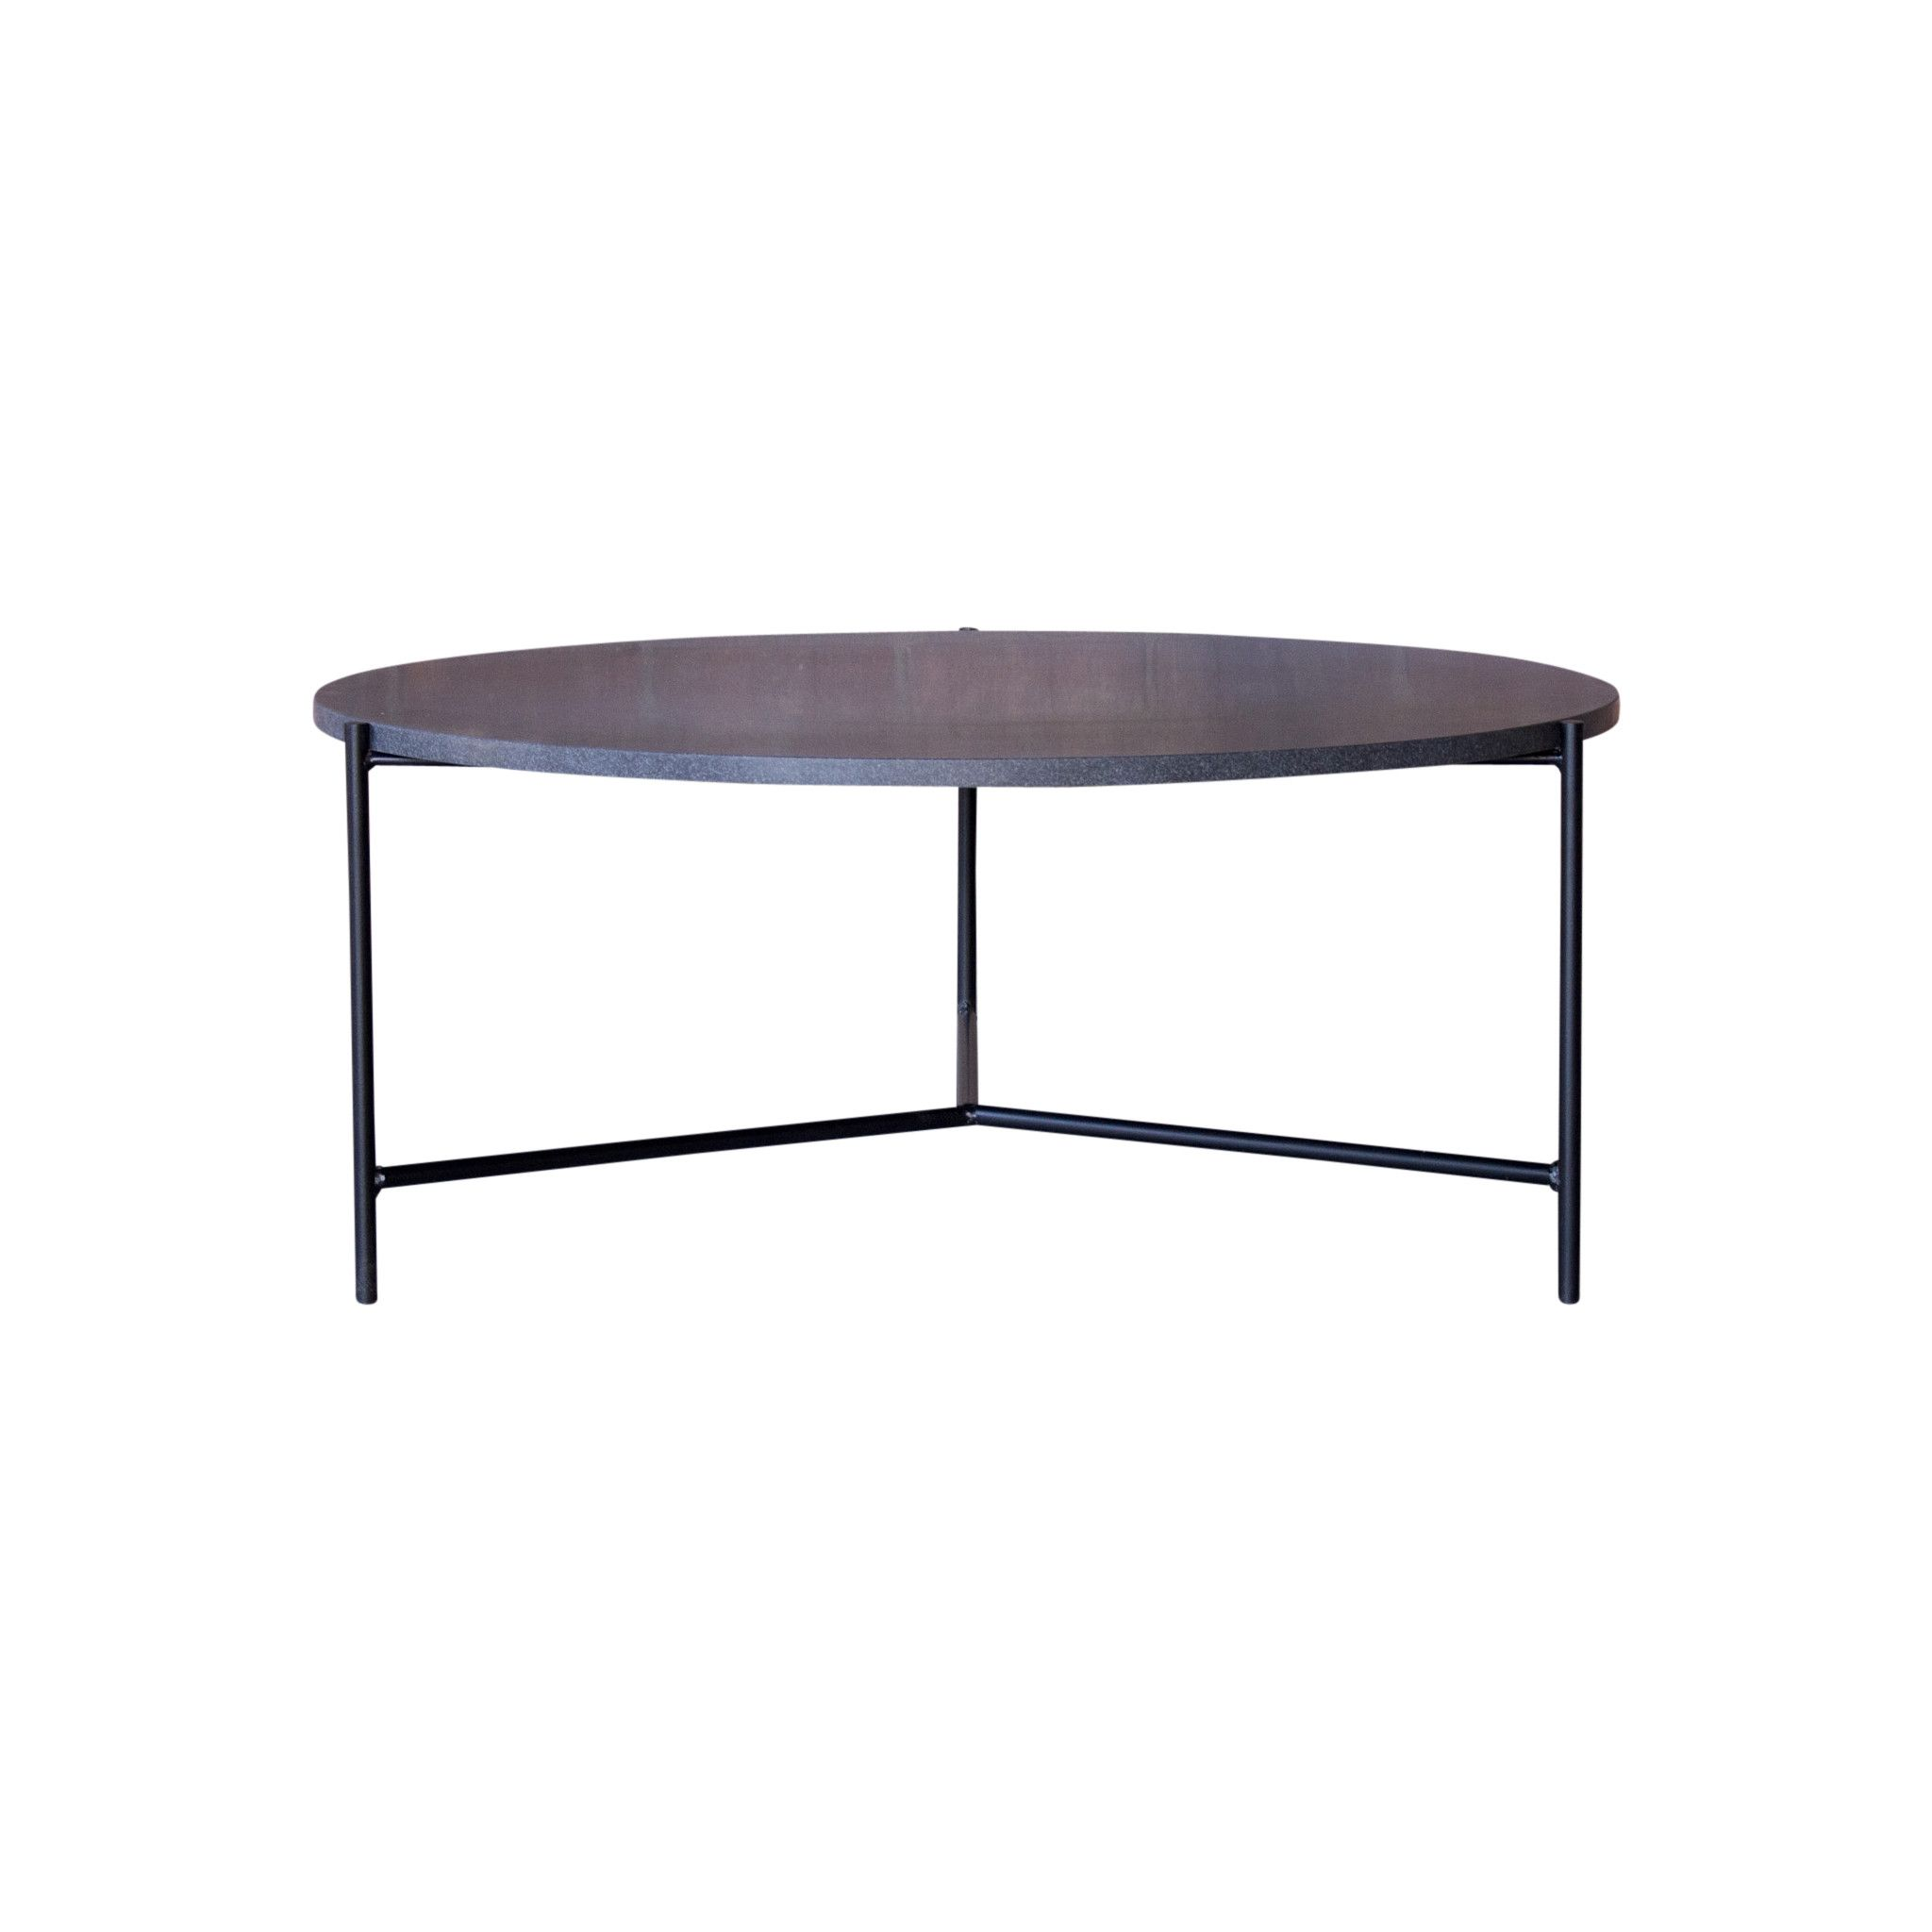 Astonishing Granada Round Coffee Table Furniture Round Coffee Table Ibusinesslaw Wood Chair Design Ideas Ibusinesslaworg